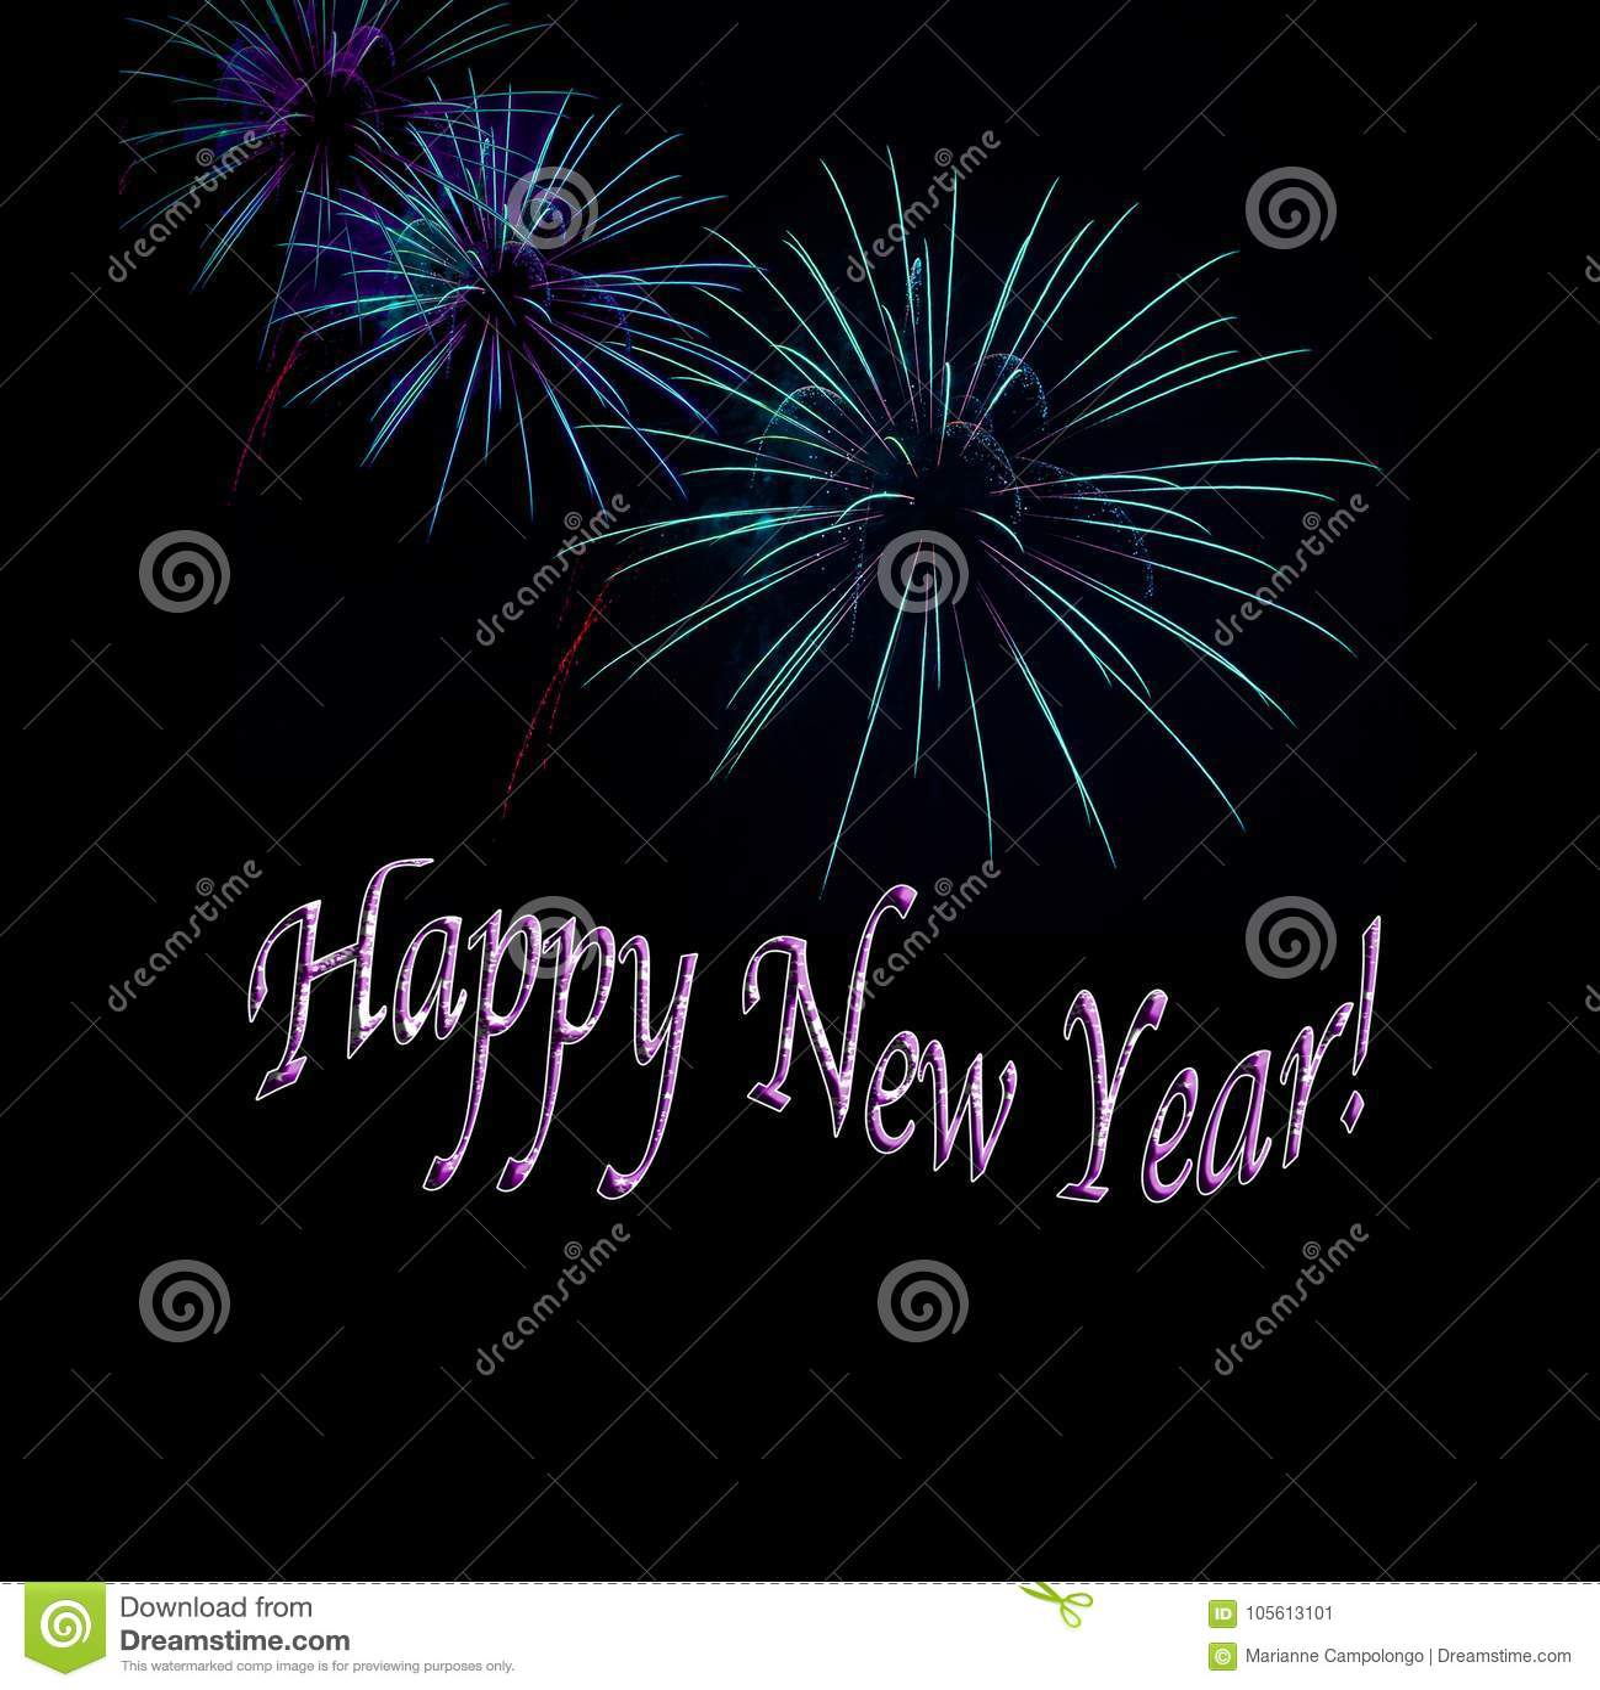 Aqua and Purple Fireworks Happy New Year